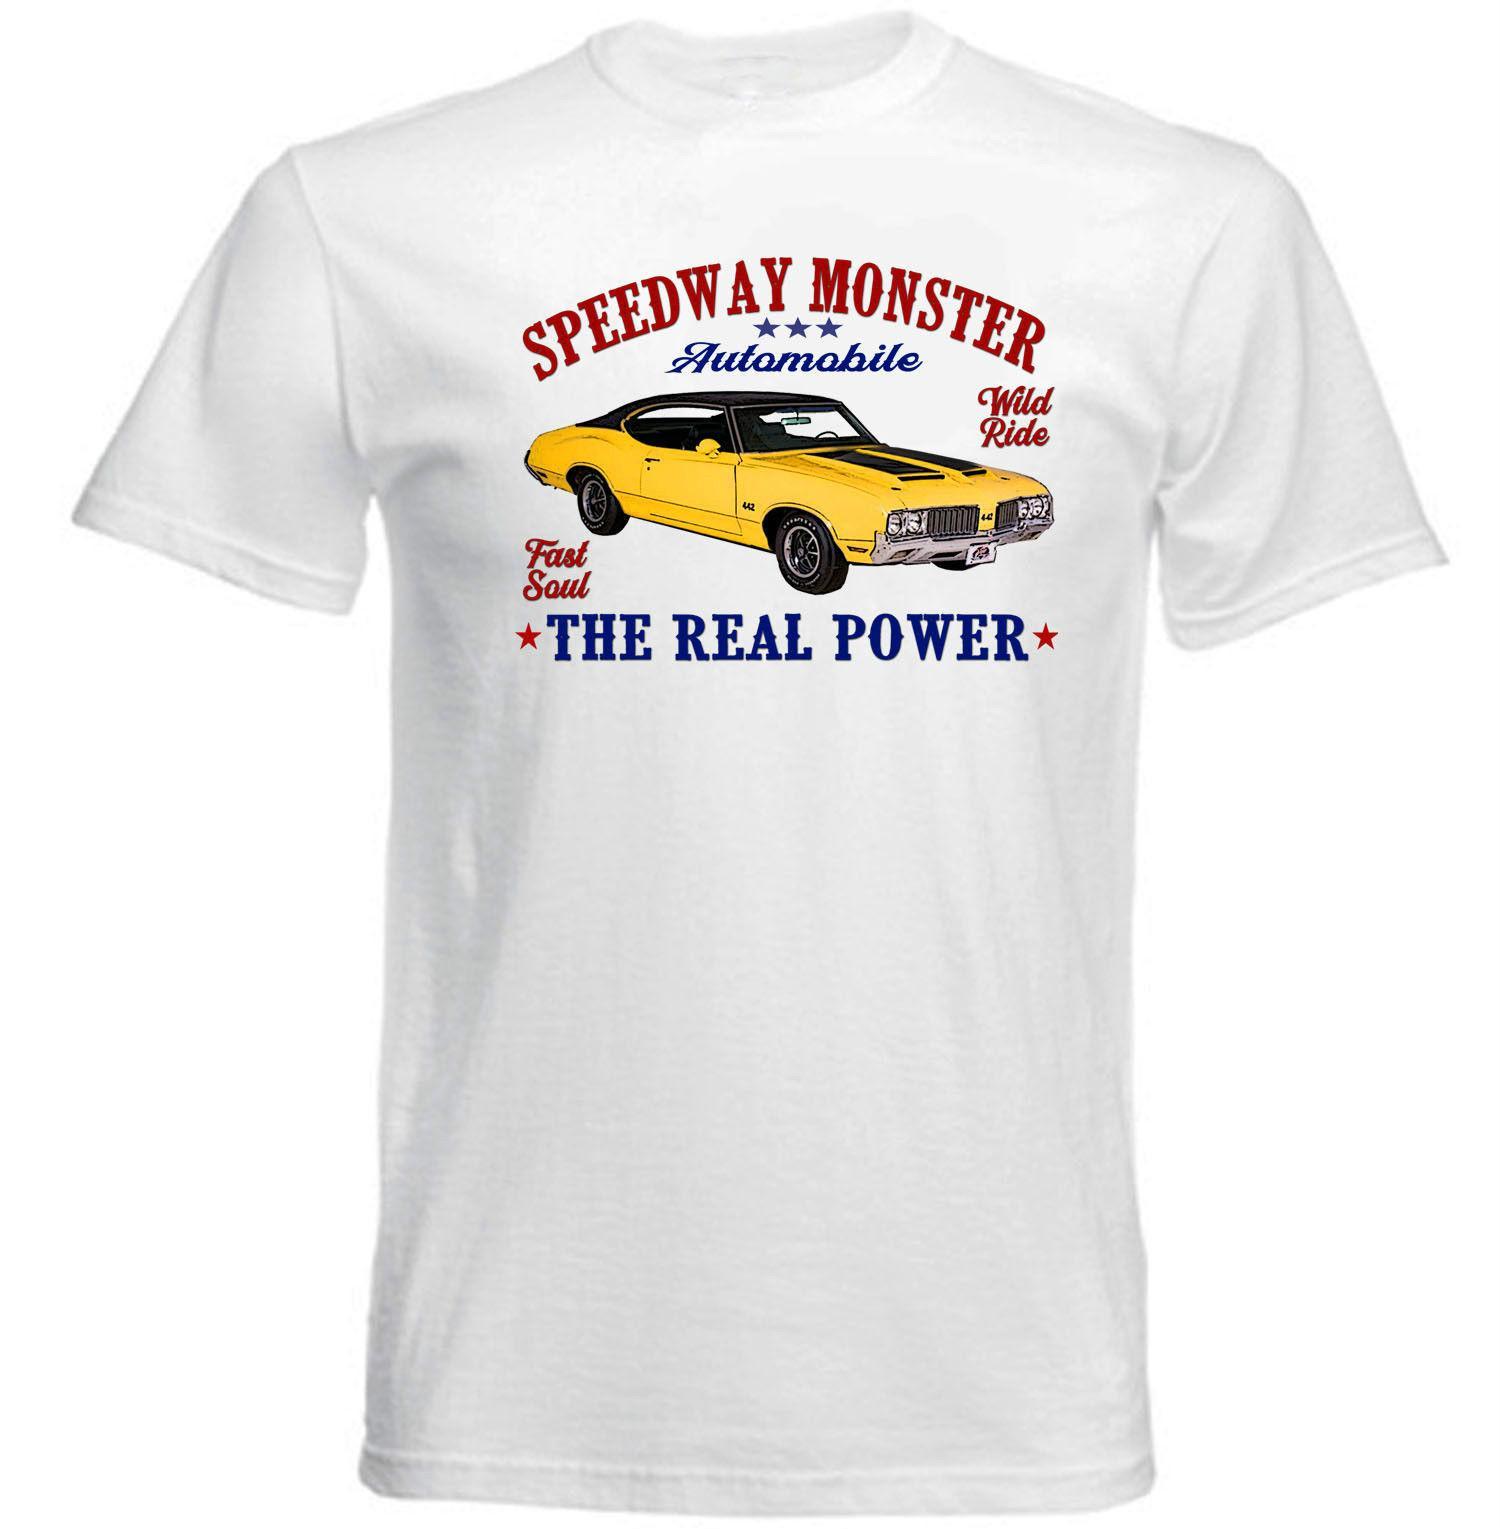 e2dd2aeb5 VINTAGE AMERICAN CAR OLDSMOBILE 442 NEW COTTON T SHIRT Tees Custom Jersey T  Shirt Print On T Shirt Cheap Funny T Shirts From Qz1538381382, $16.24|  DHgate.